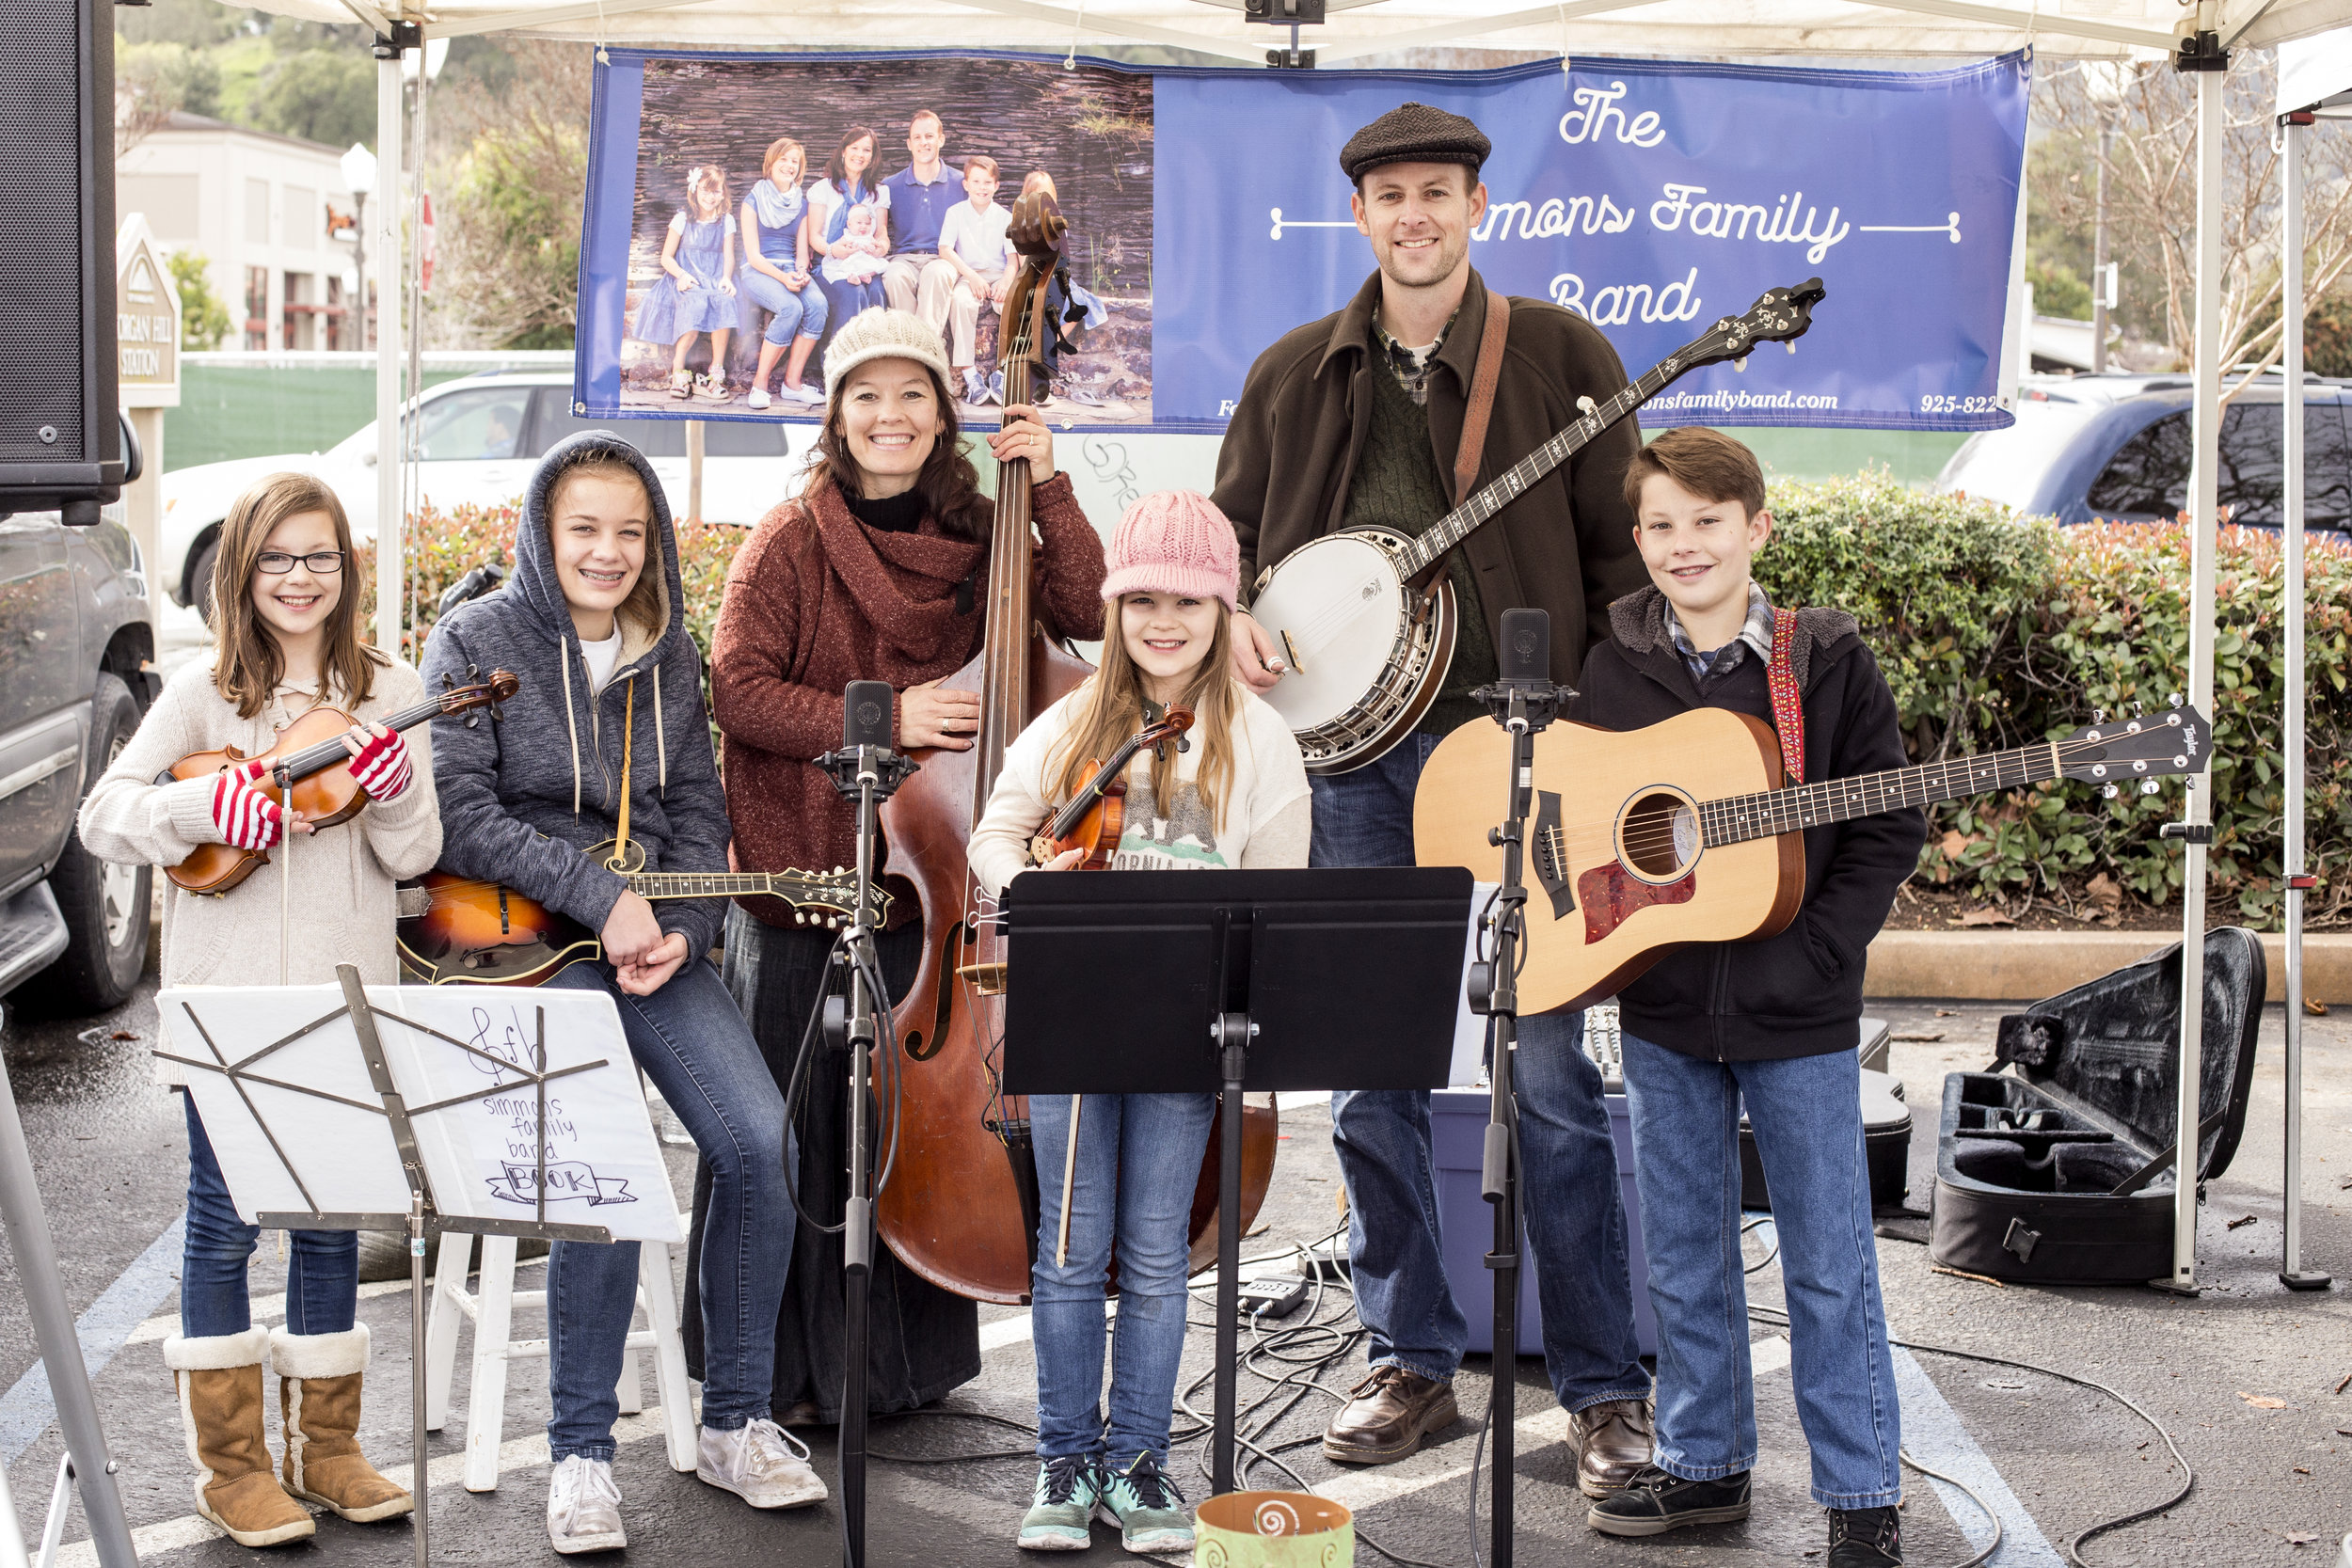 Simmons Family Band playing at the Morgan Hill Farmers Market